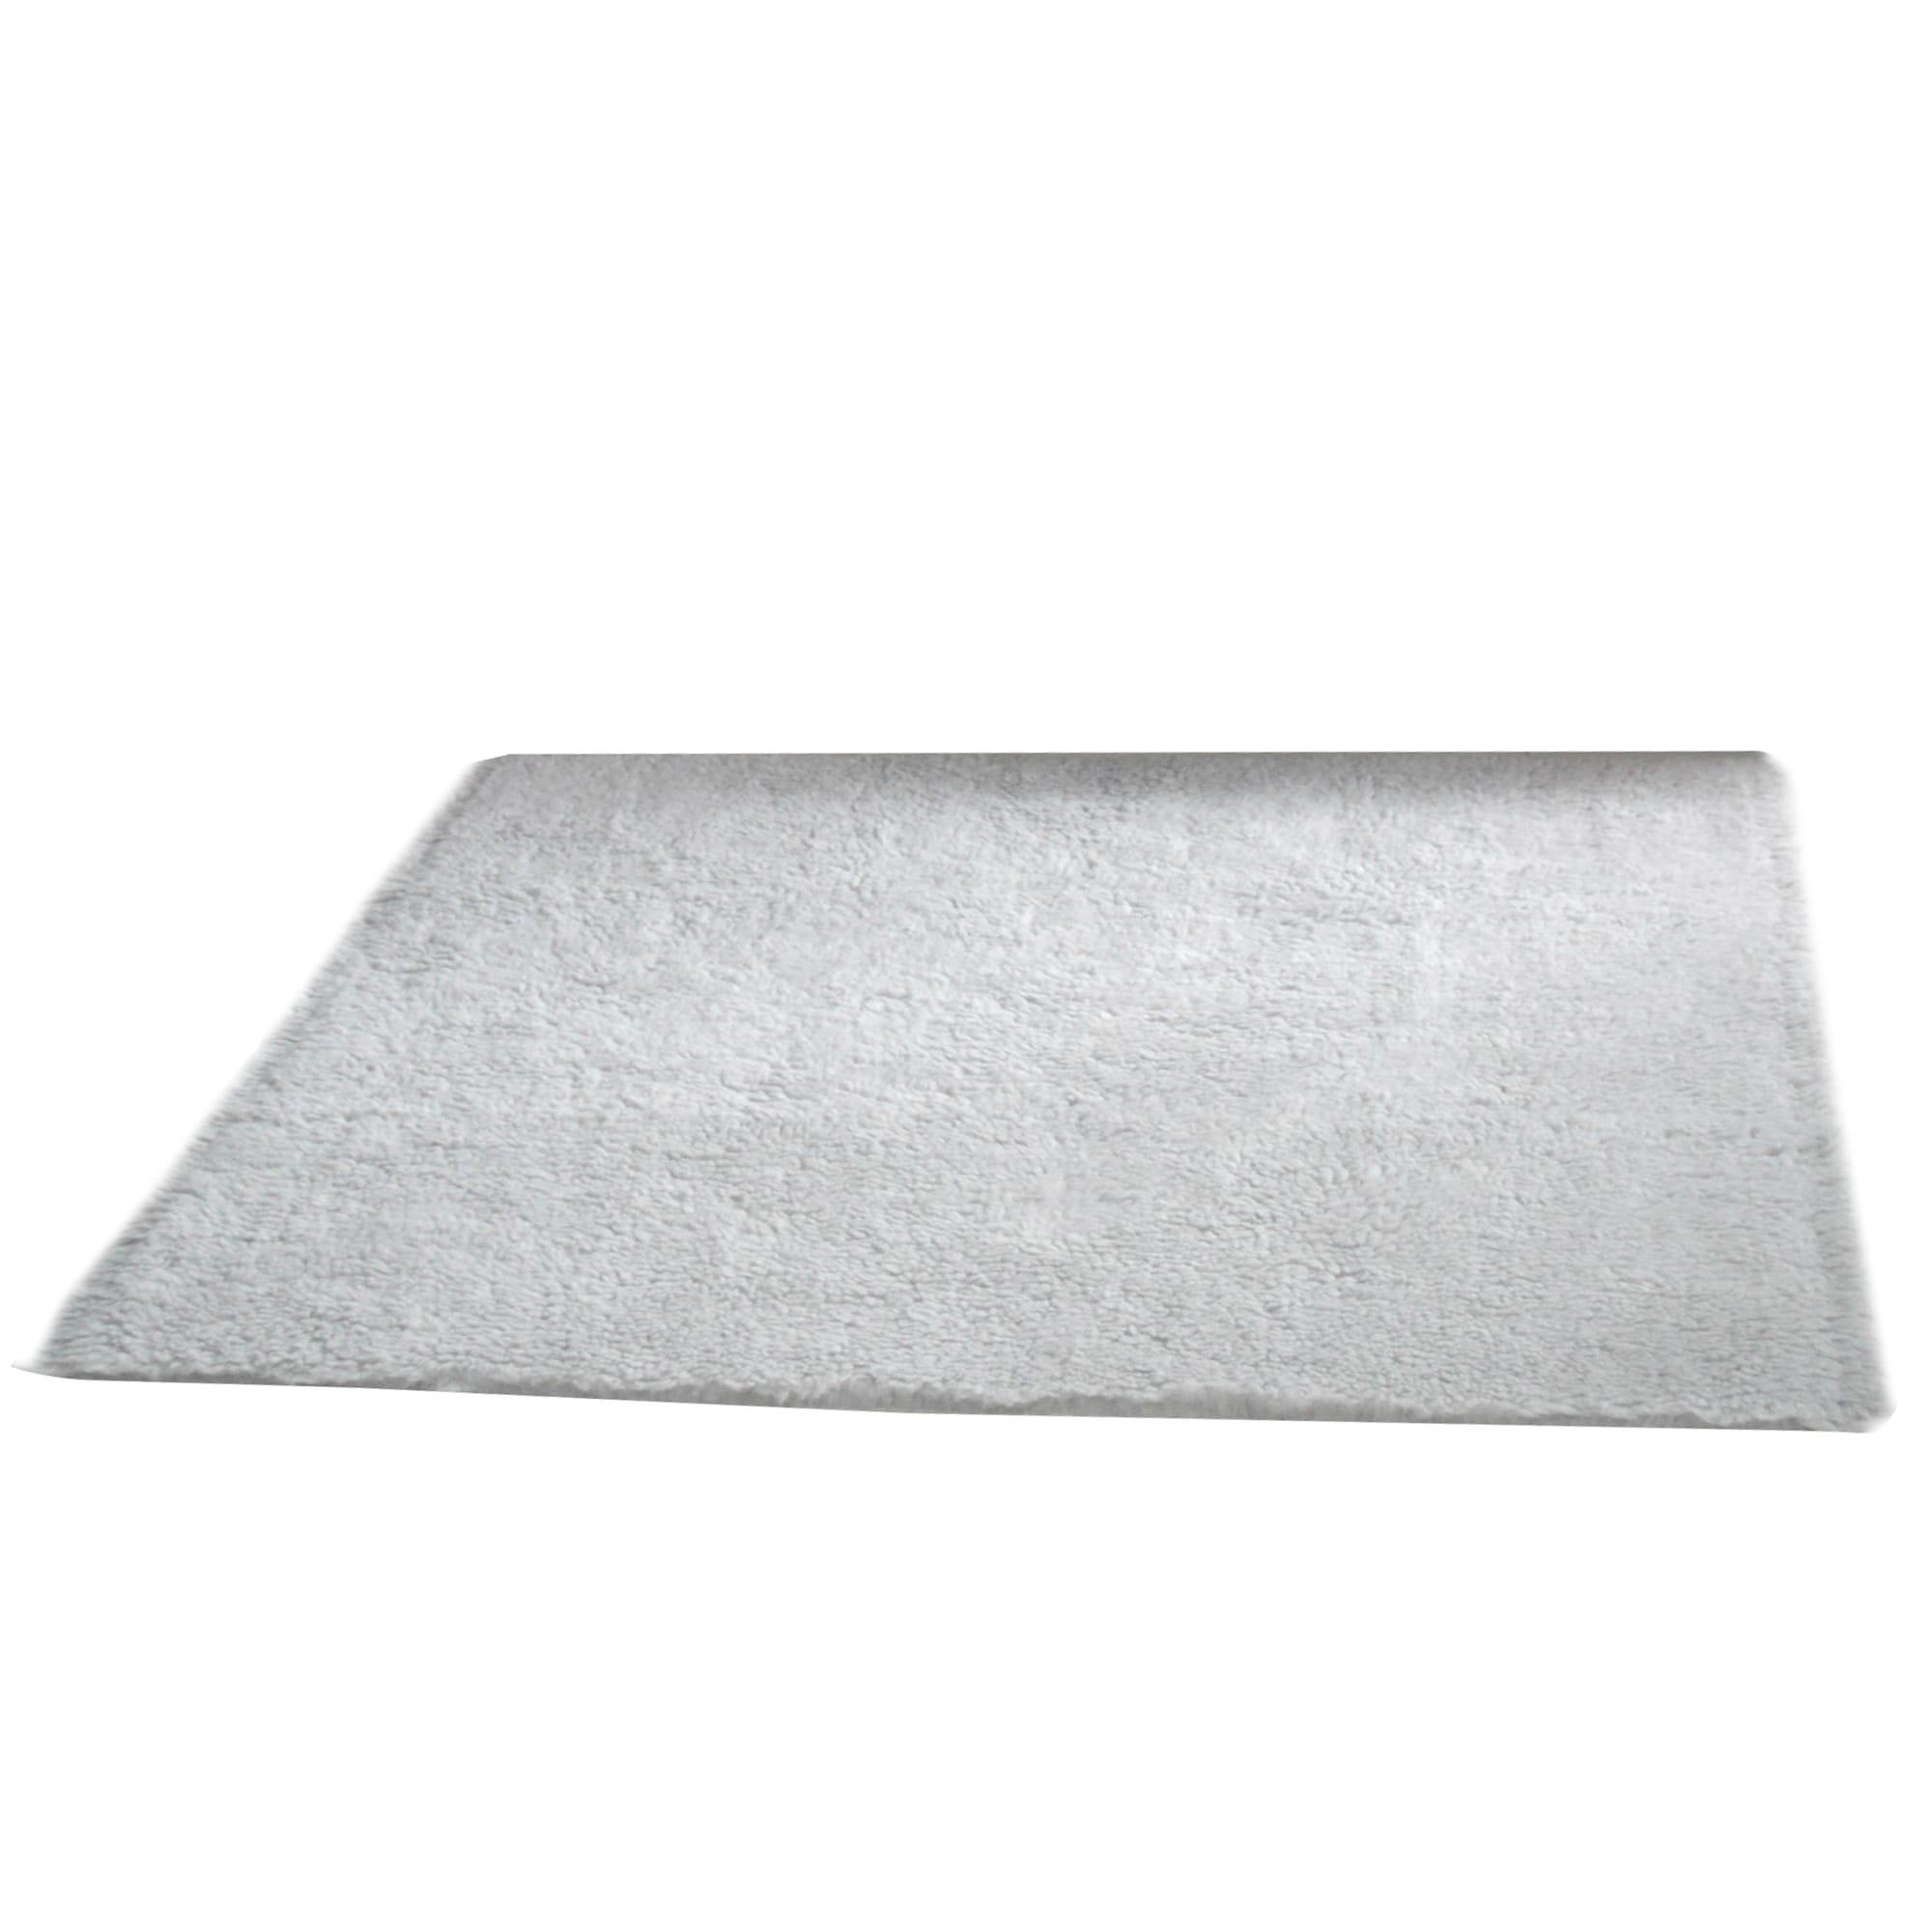 Decoku Karpet Bulu Anti Skid Abu Muda 130x100cm